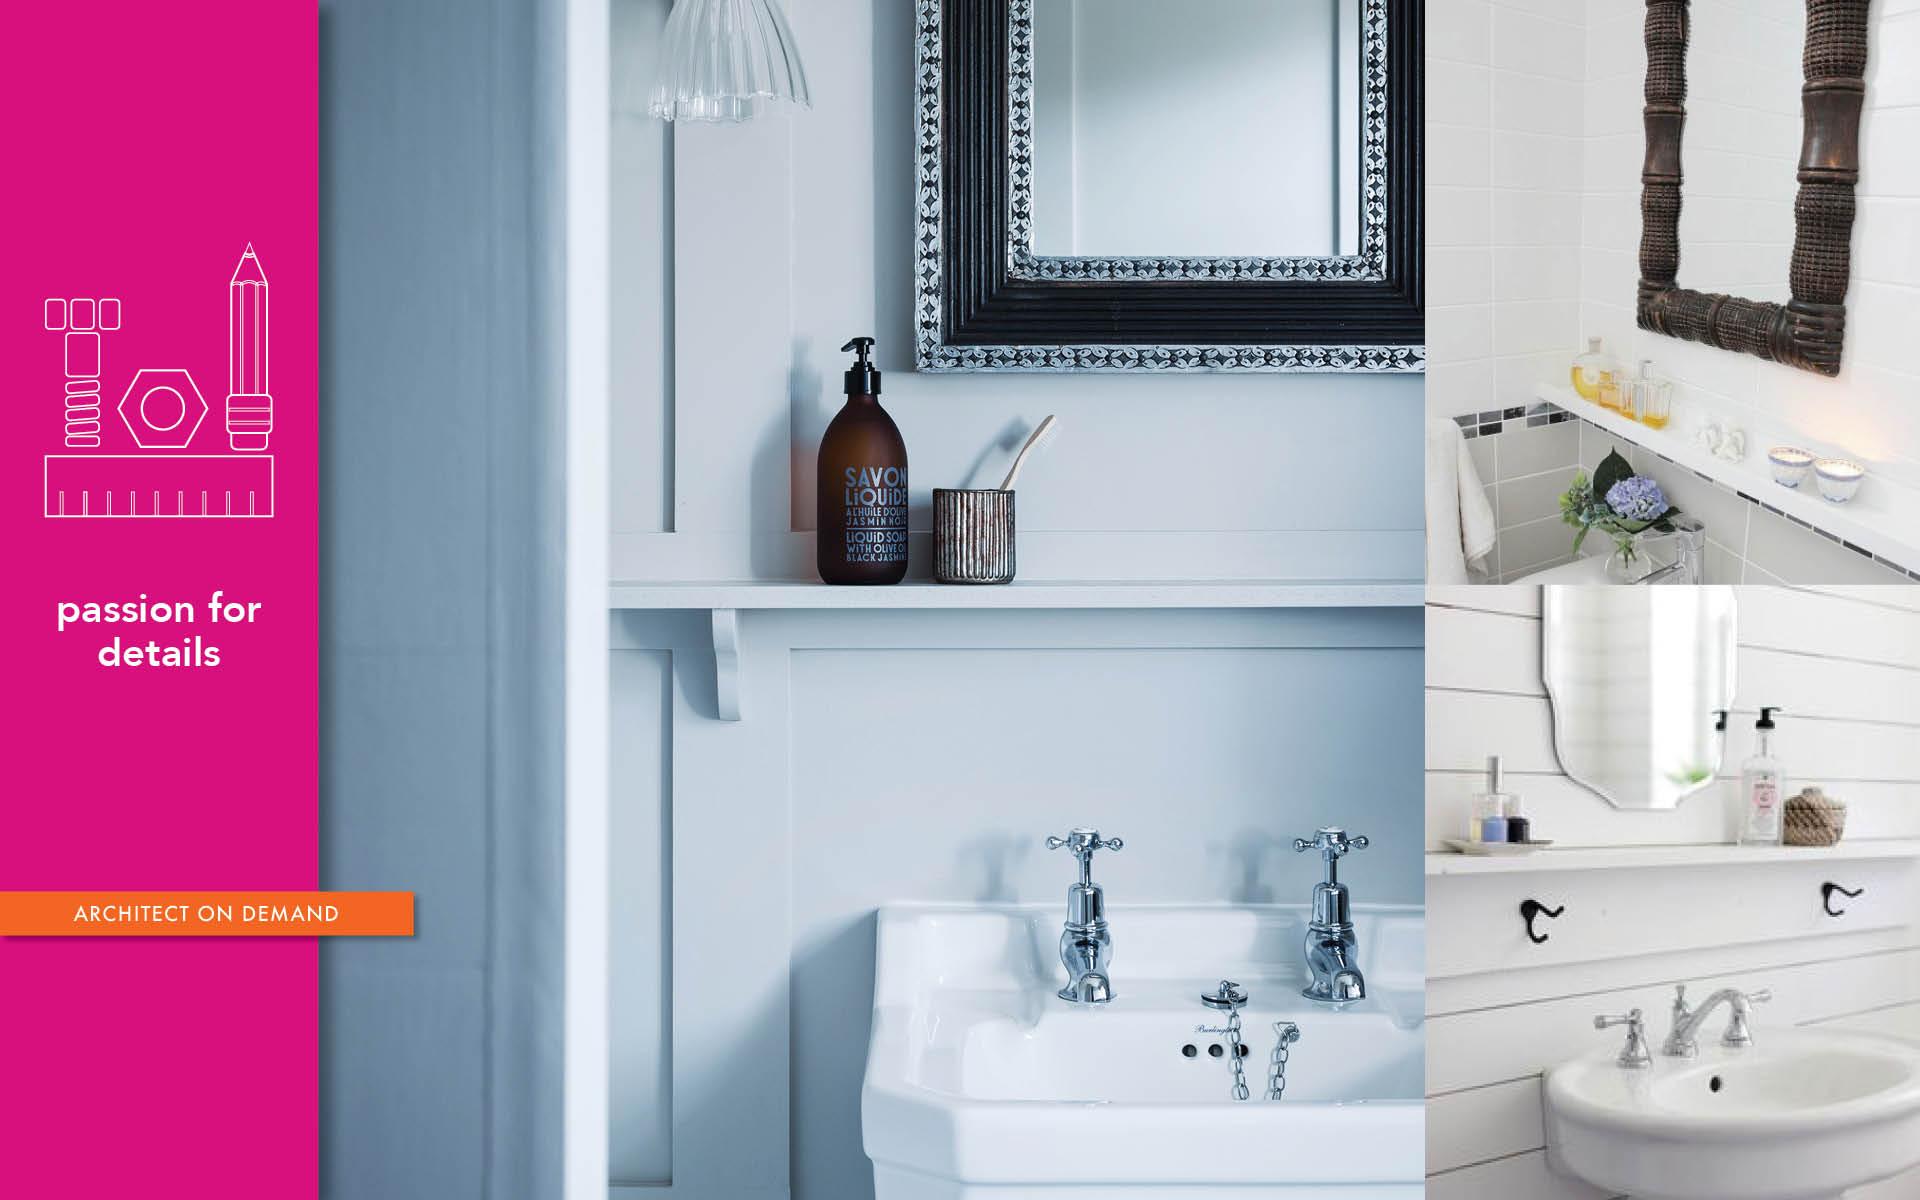 little details, bath, shelf, architect on demand, advice without strings